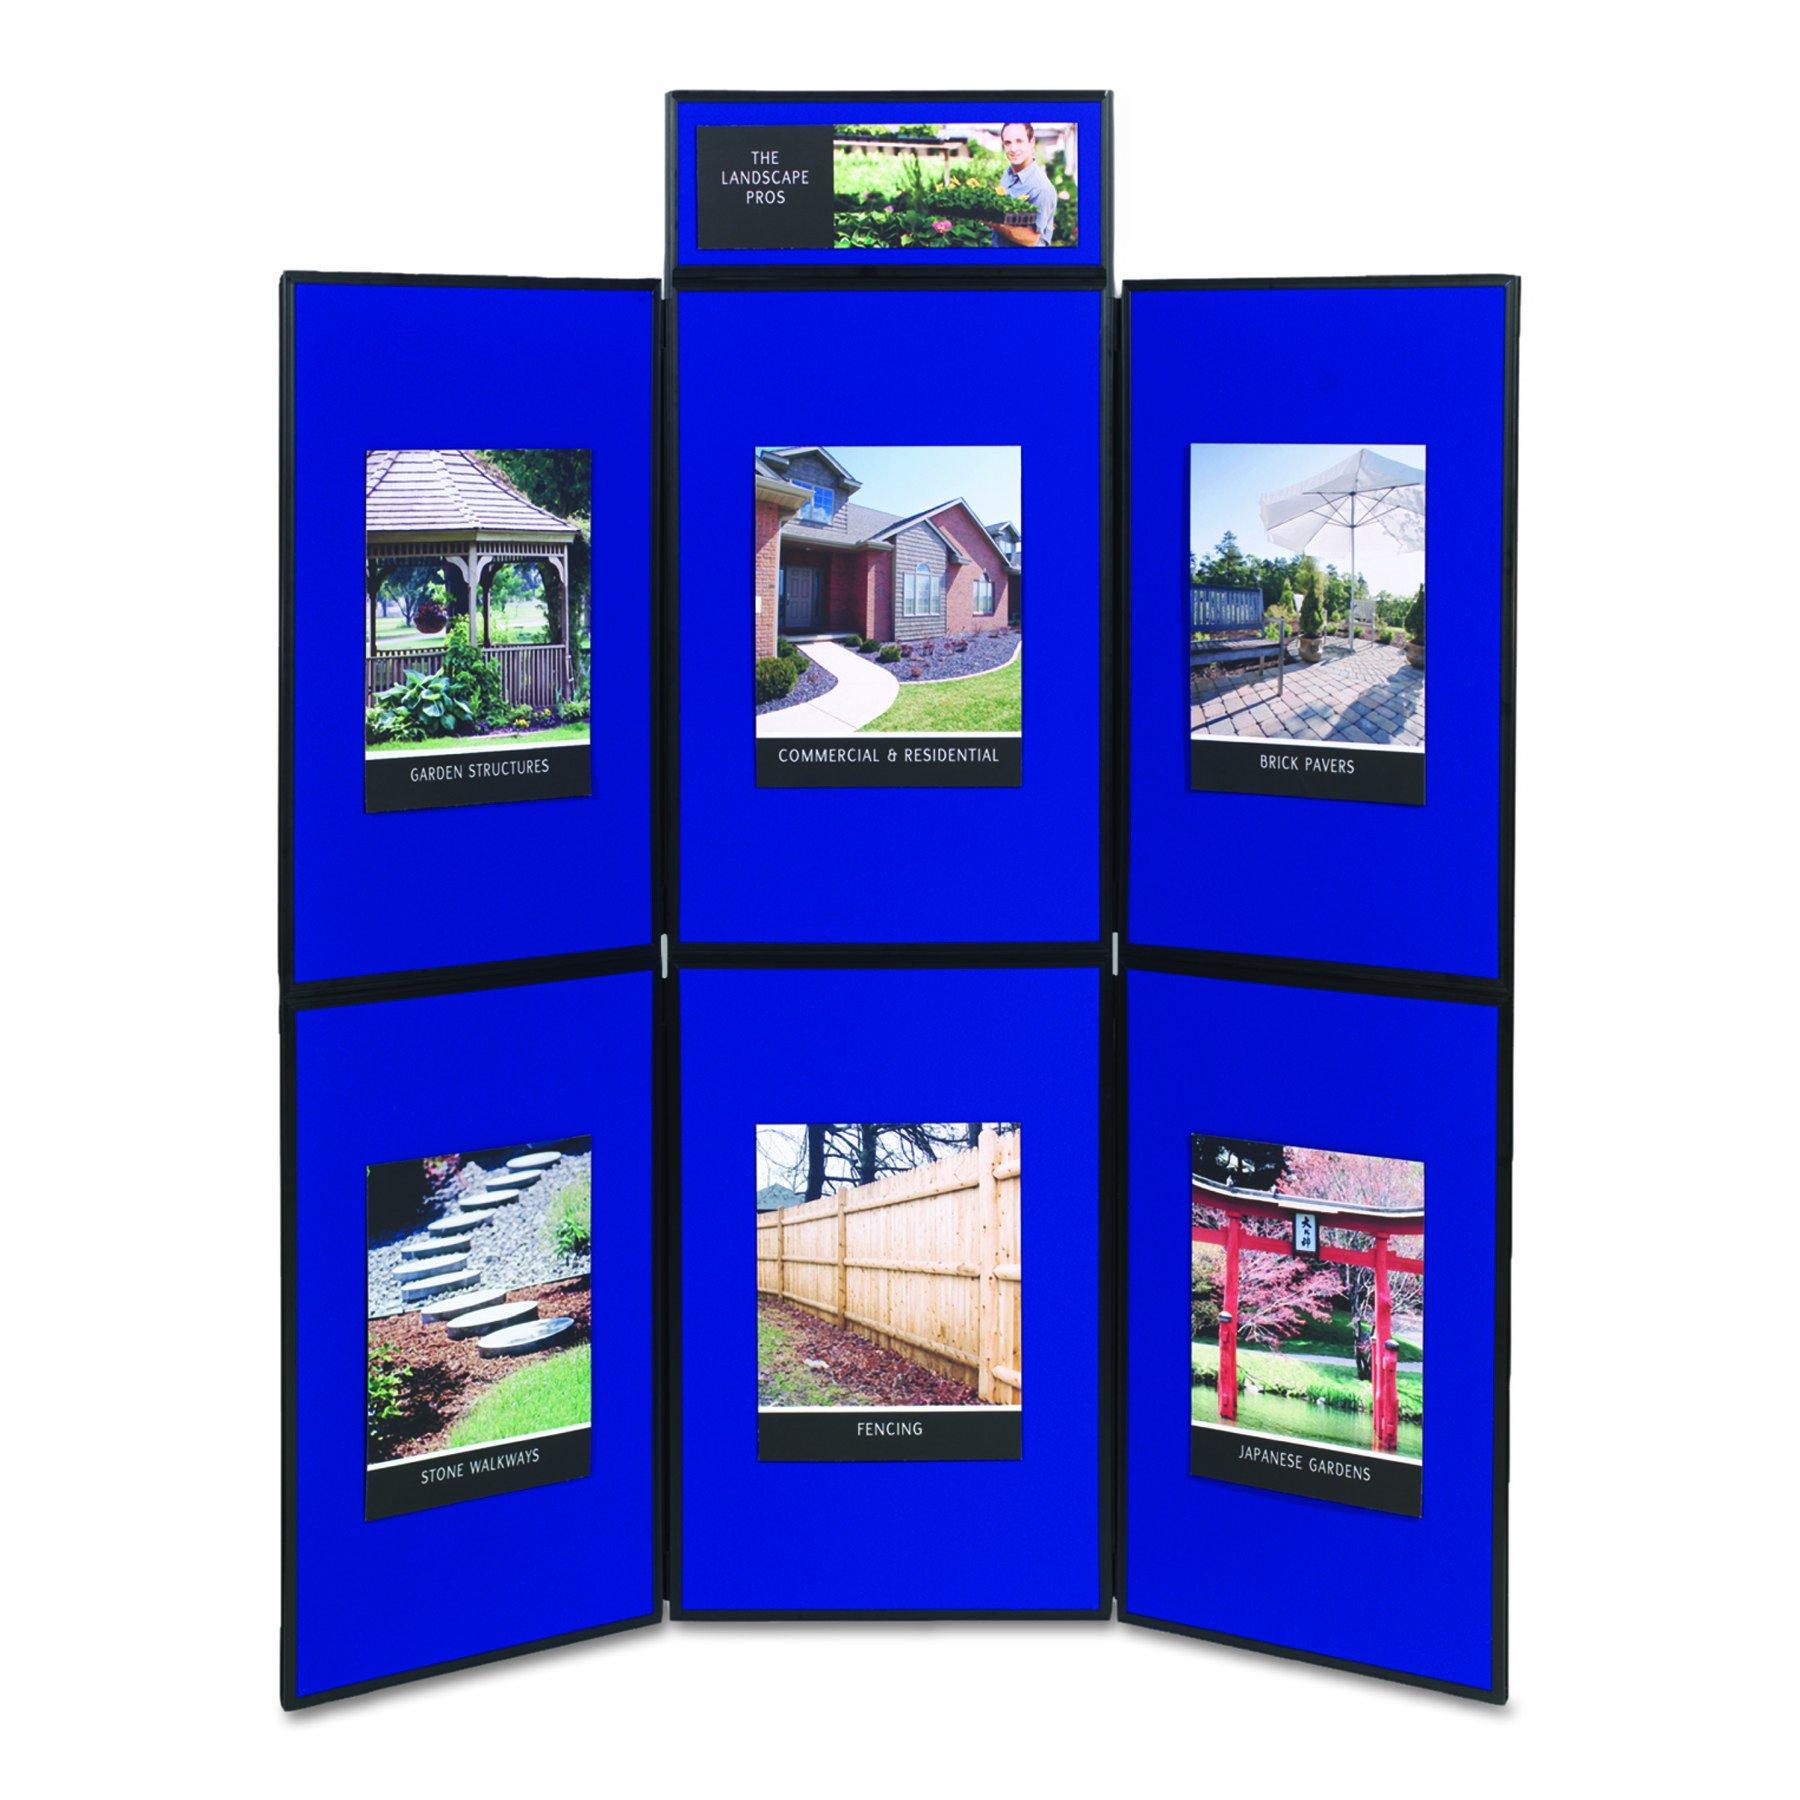 Quartet SB93516Q Show-It! Display System, 72 x 72, Blue/Gray Surface, Black Frame